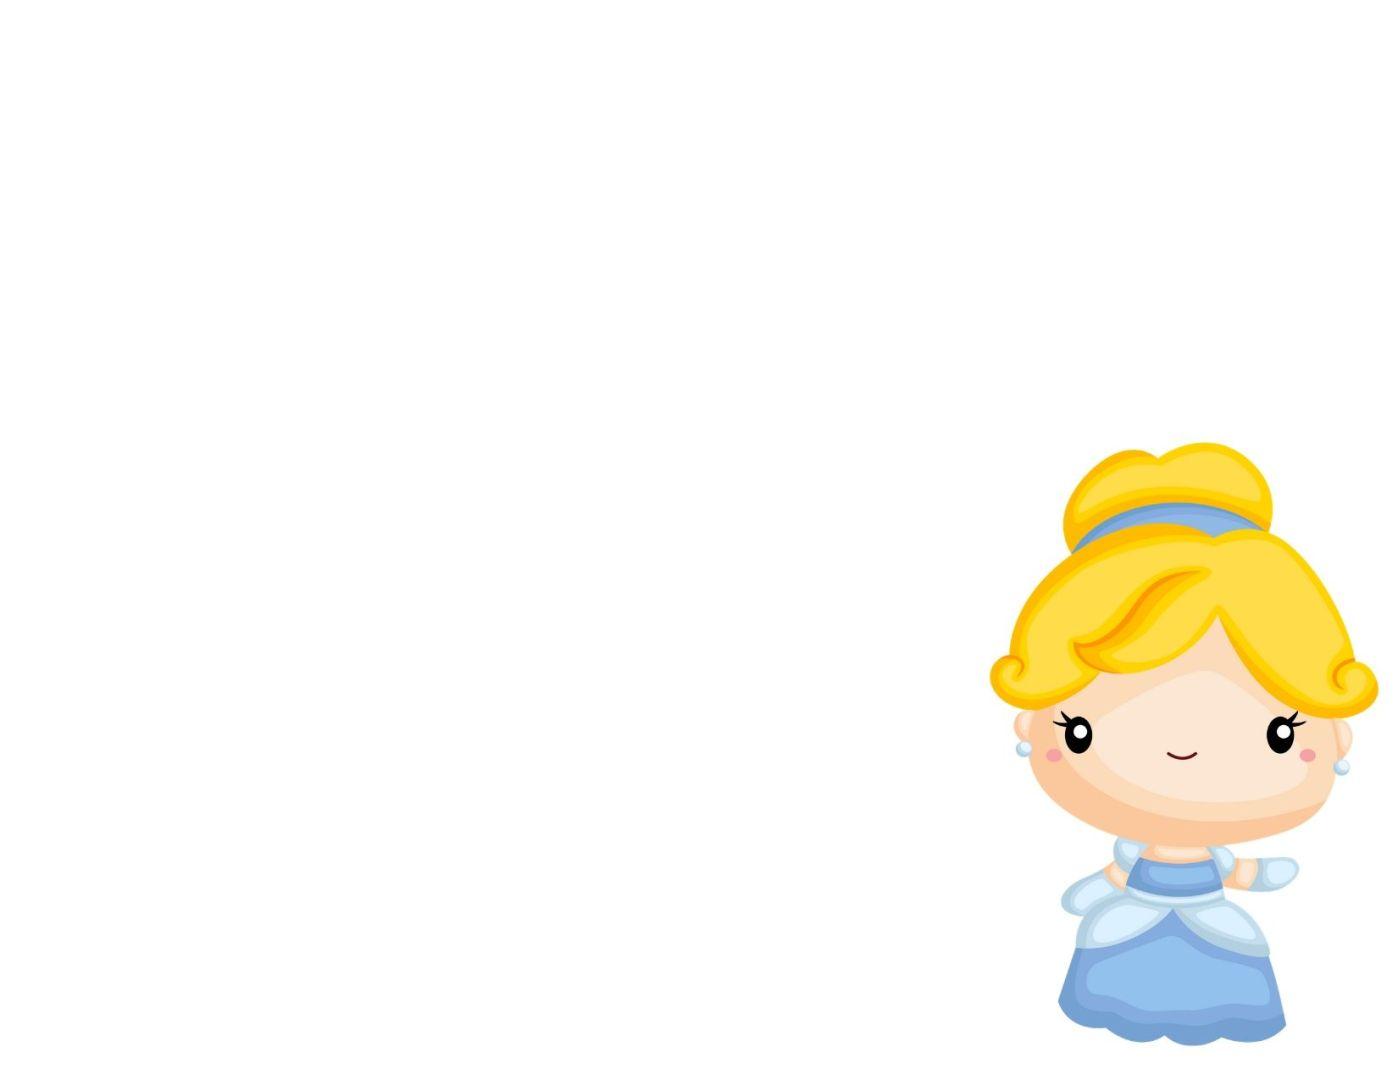 Cinderella autograph page | AlwaysMovingMommy.com